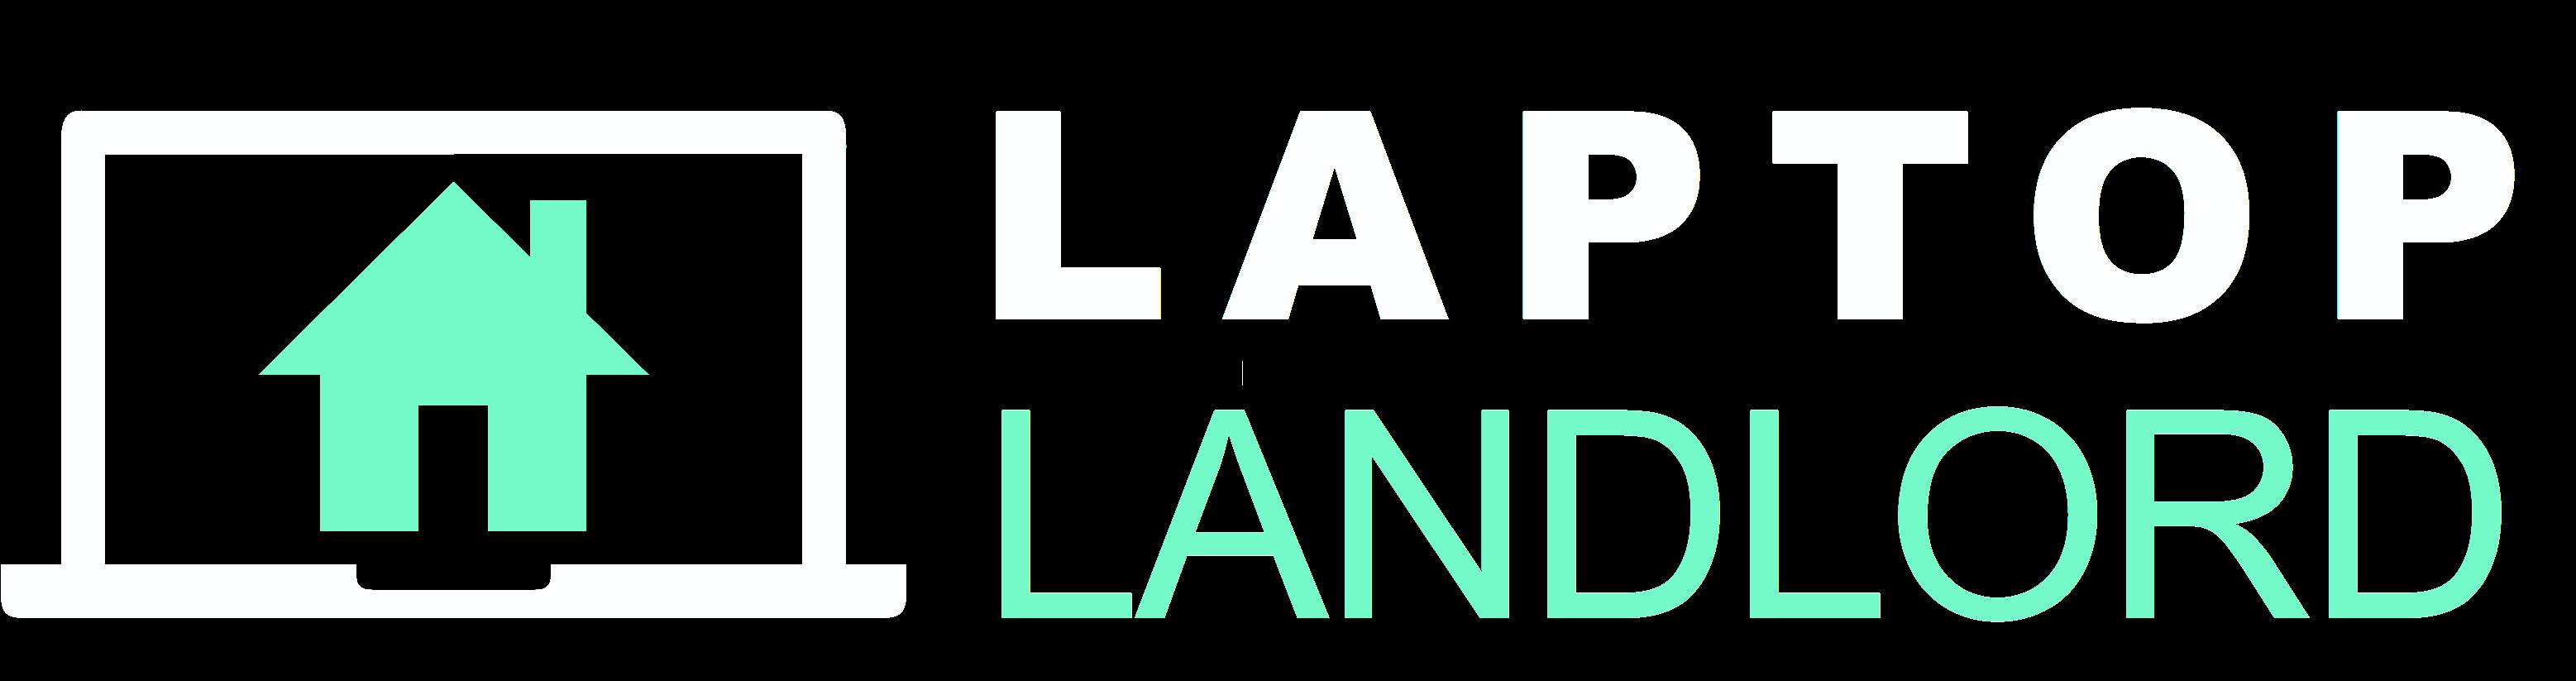 @LaptopLandlord